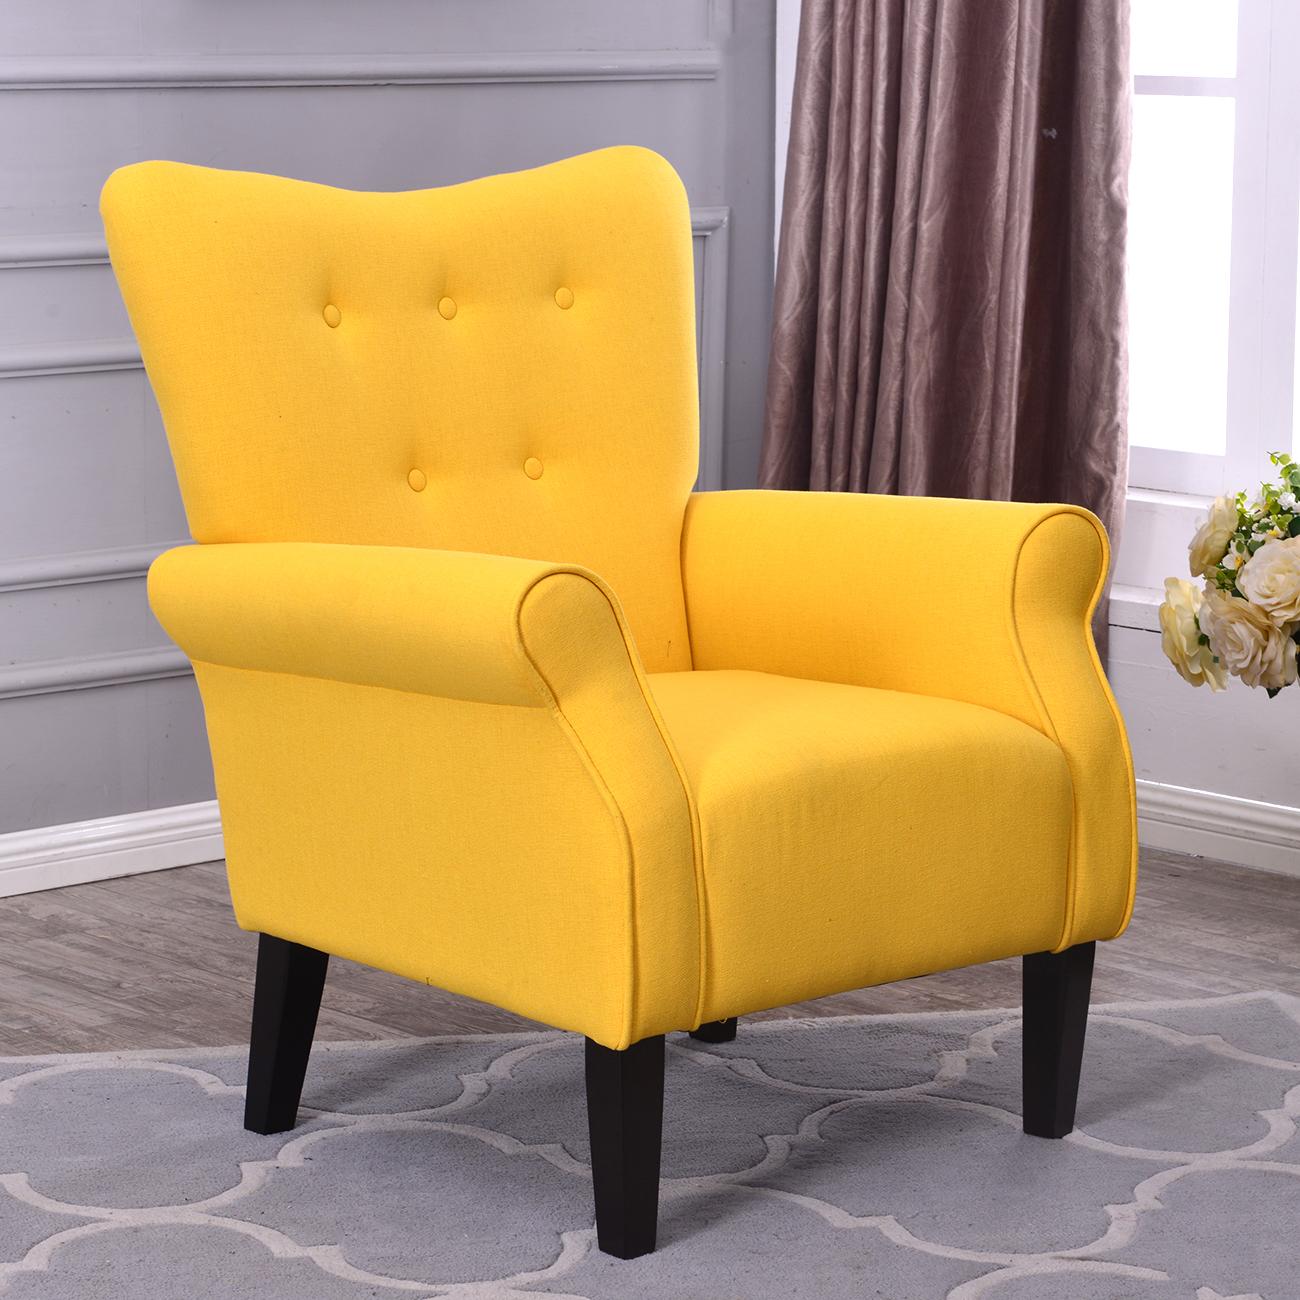 Belleze Modern Accent Chair Roll Arm Linen Living Room Bedroom Wood